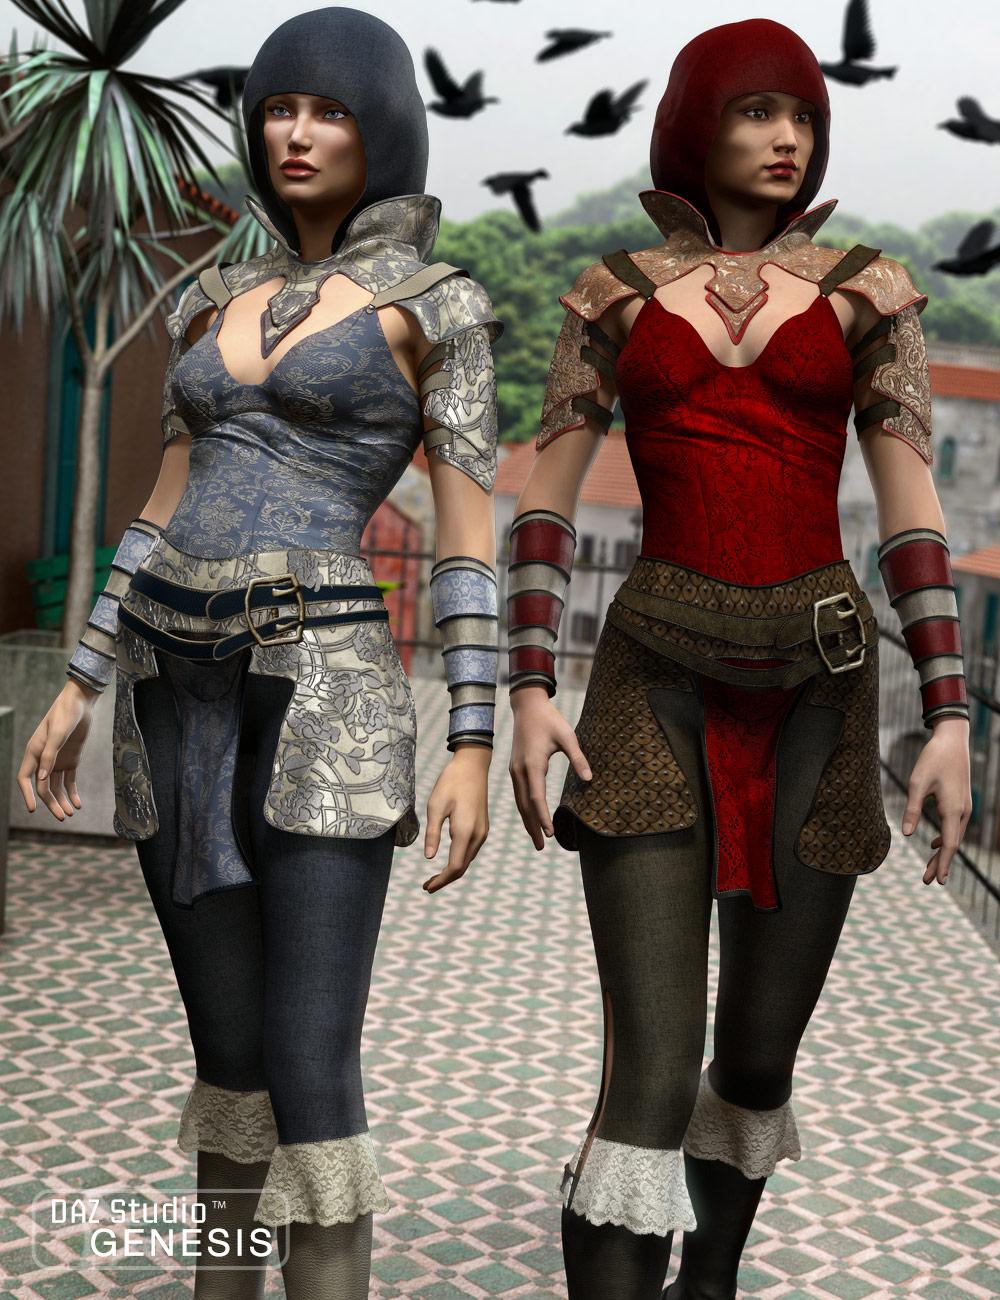 Eldorin Textures by: Sarsa, 3D Models by Daz 3D